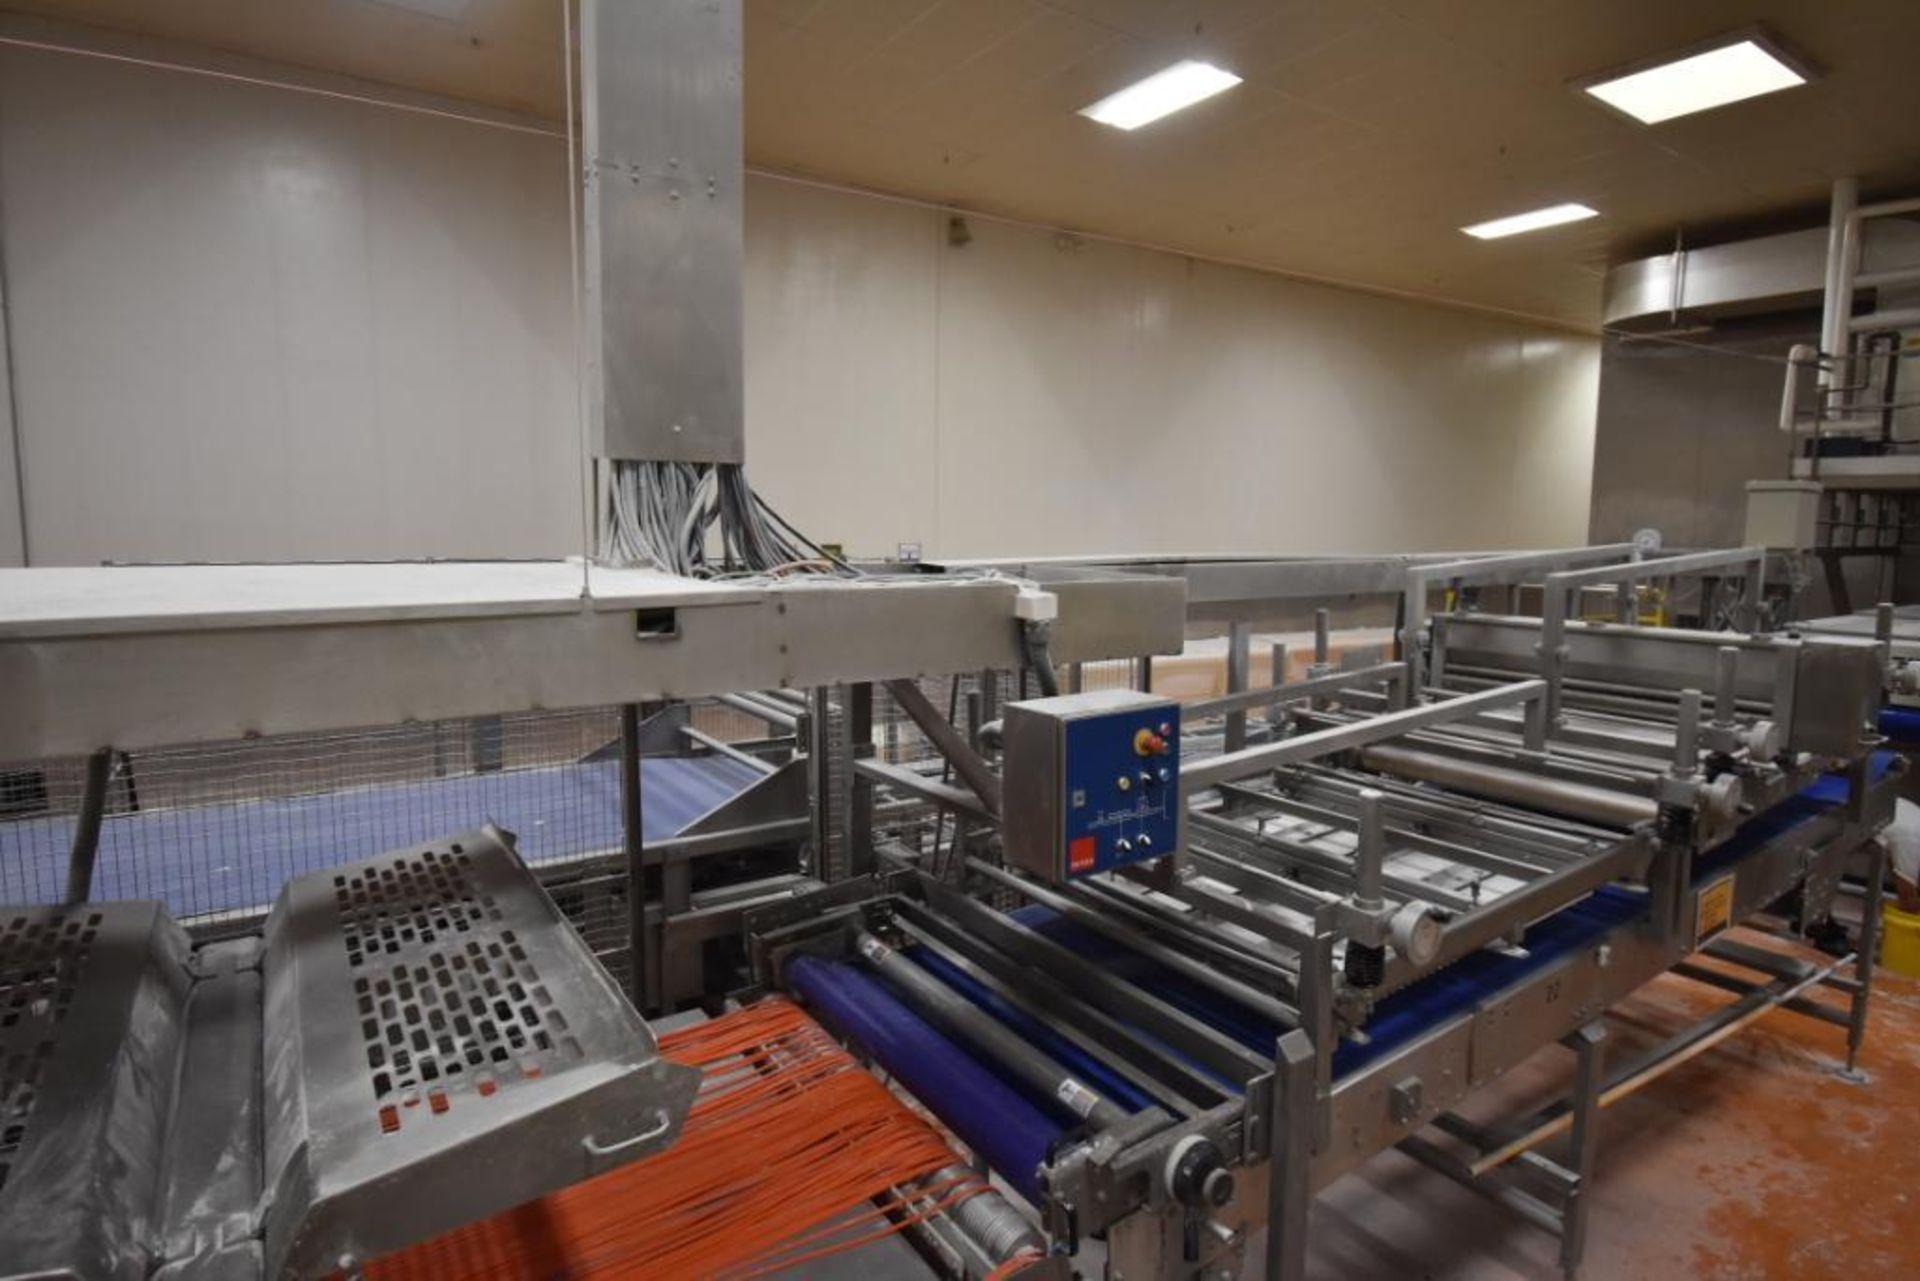 2007 Fritsch Laminator 3000 dough line - Image 235 of 280